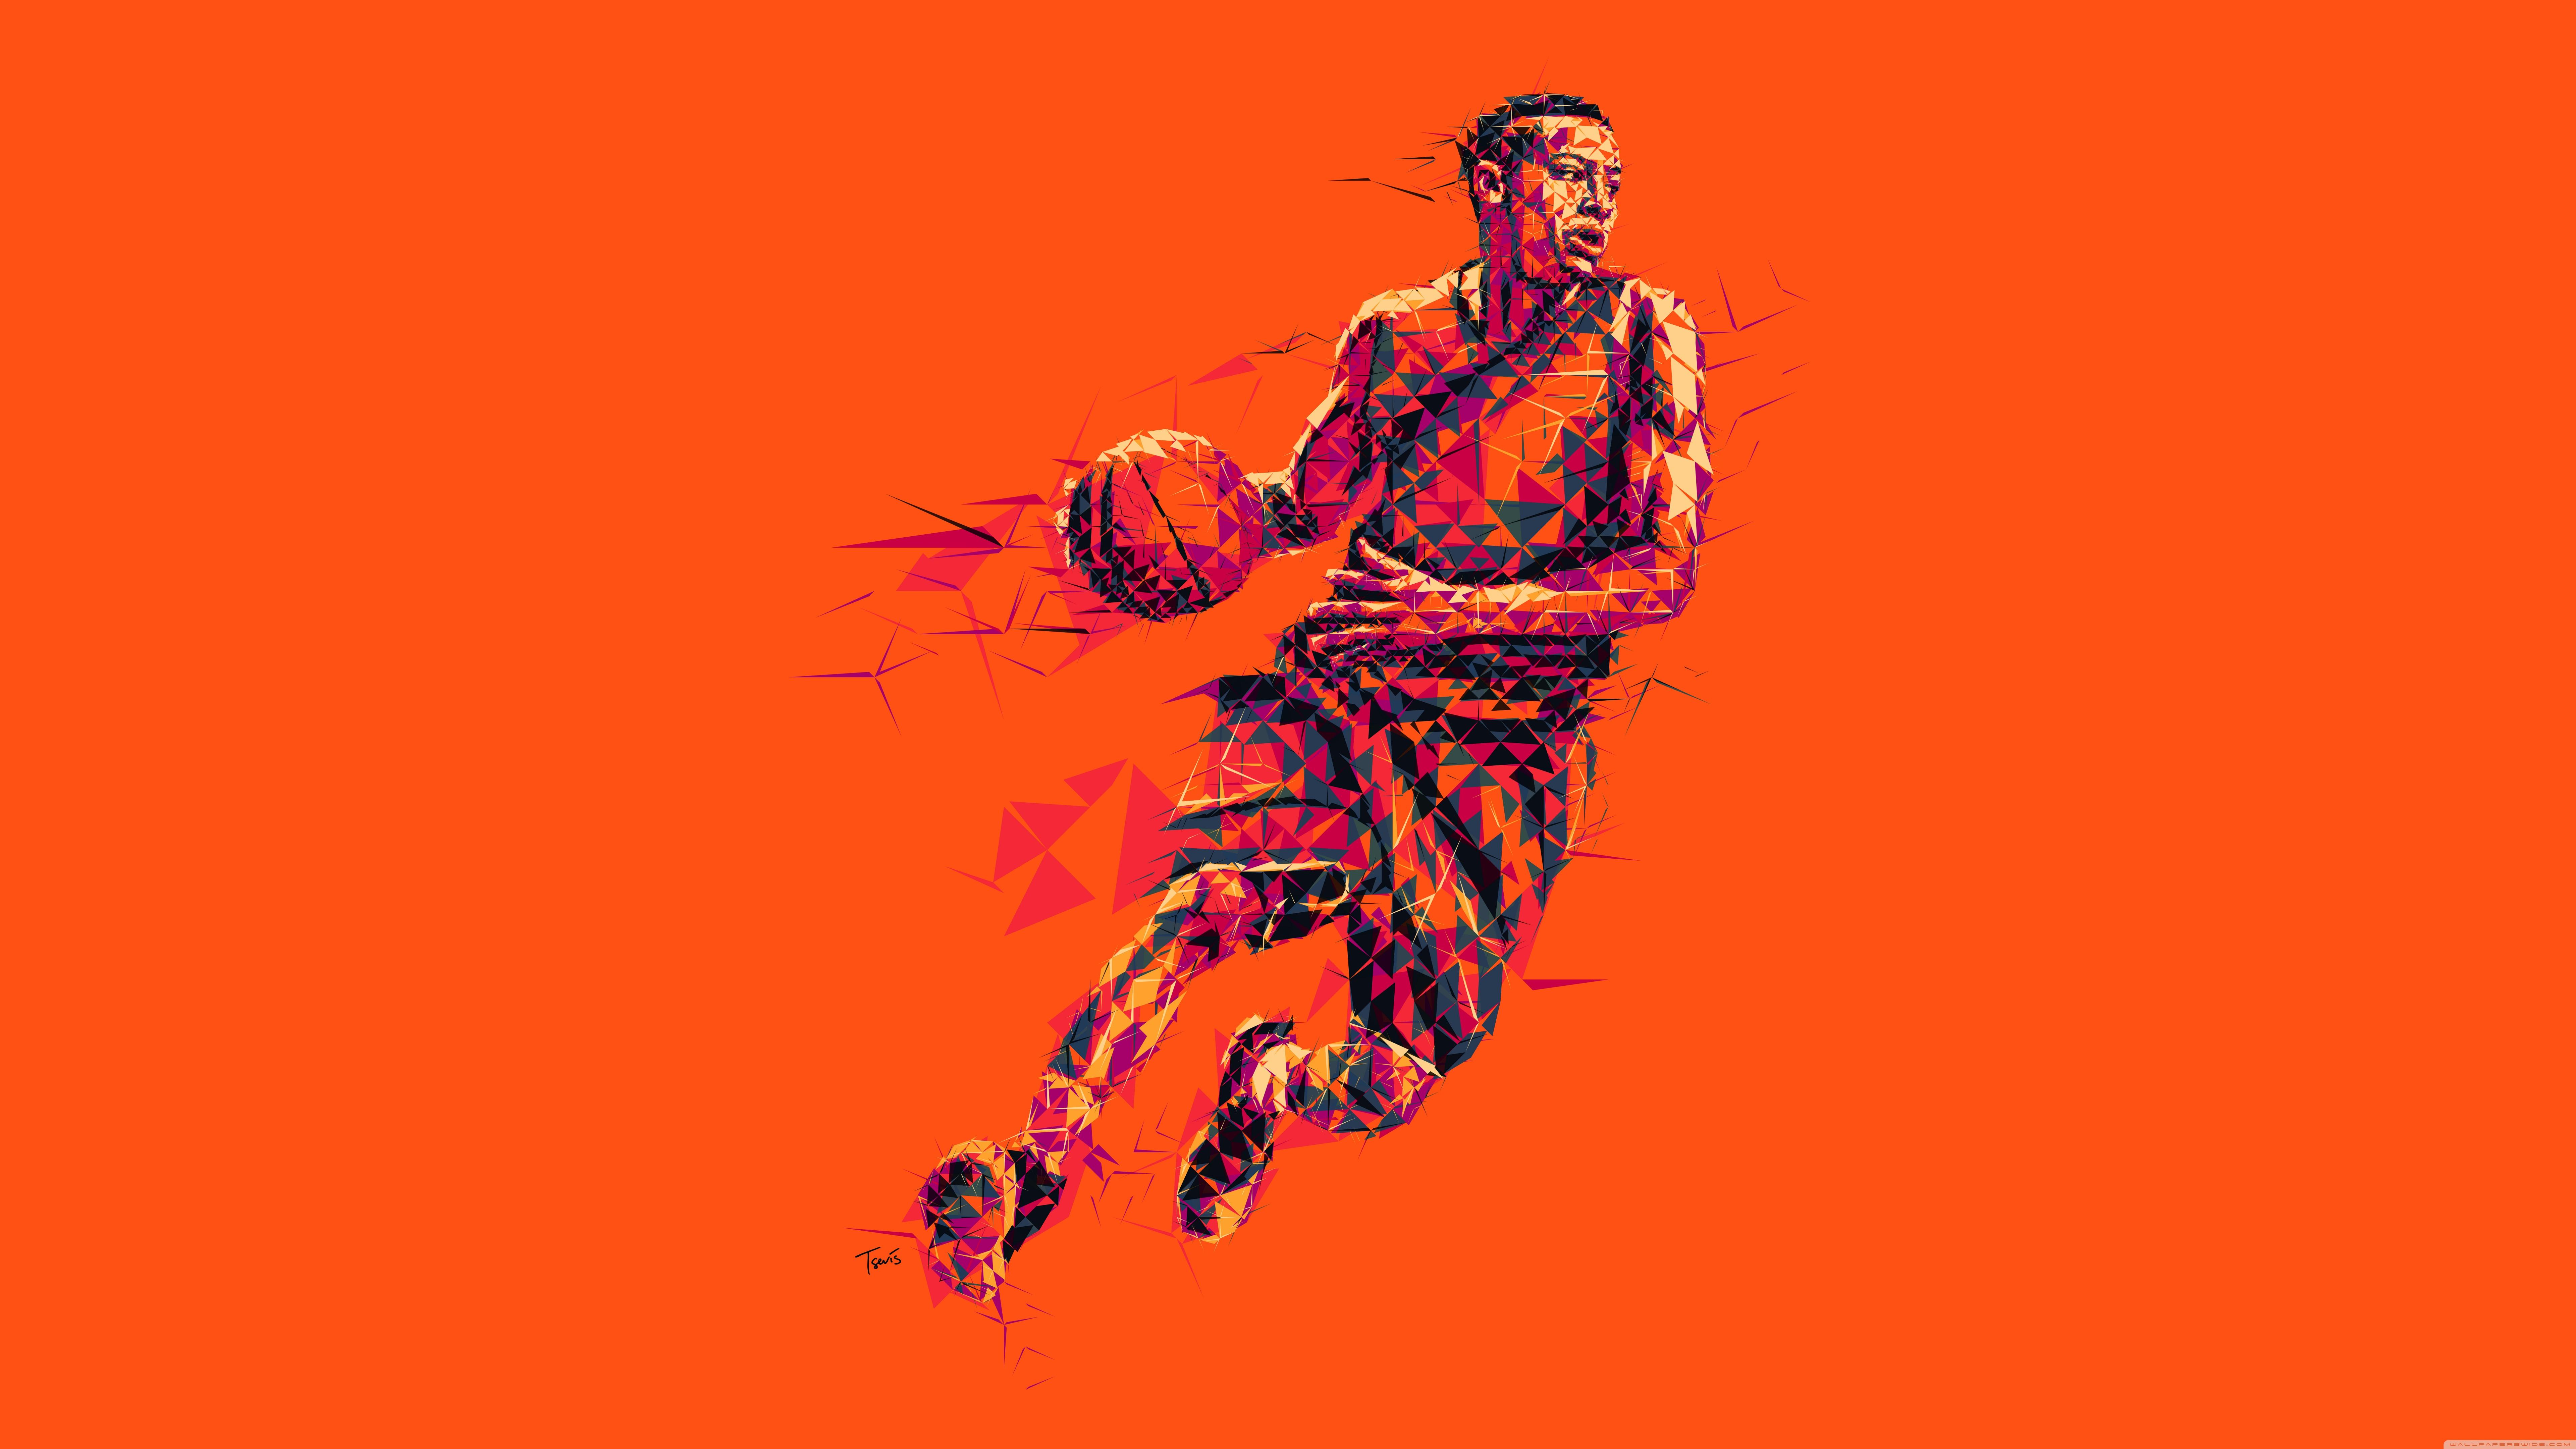 Sports Basketball 7680x4320